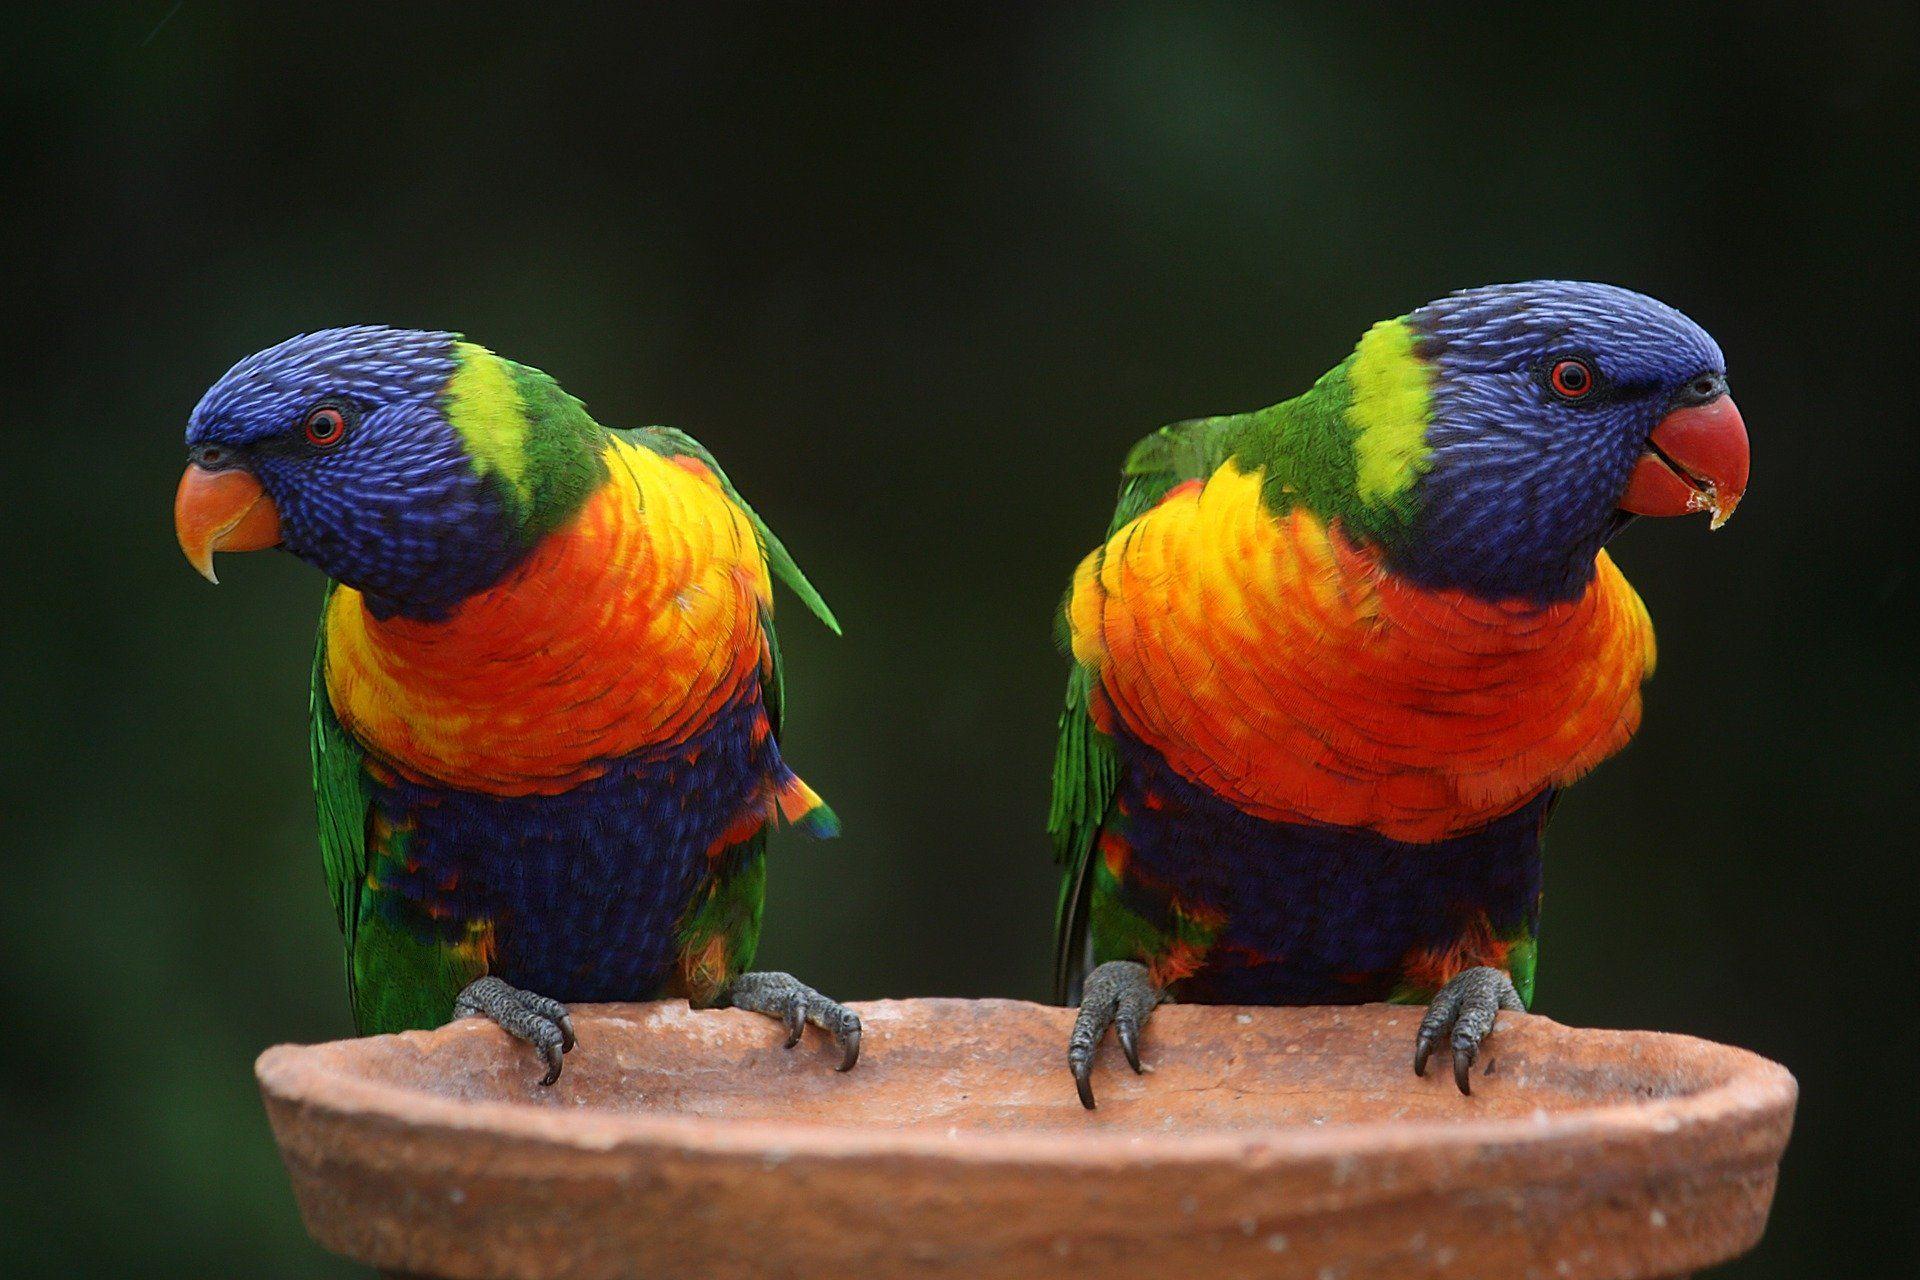 Домашний попугай красивой окраски дома